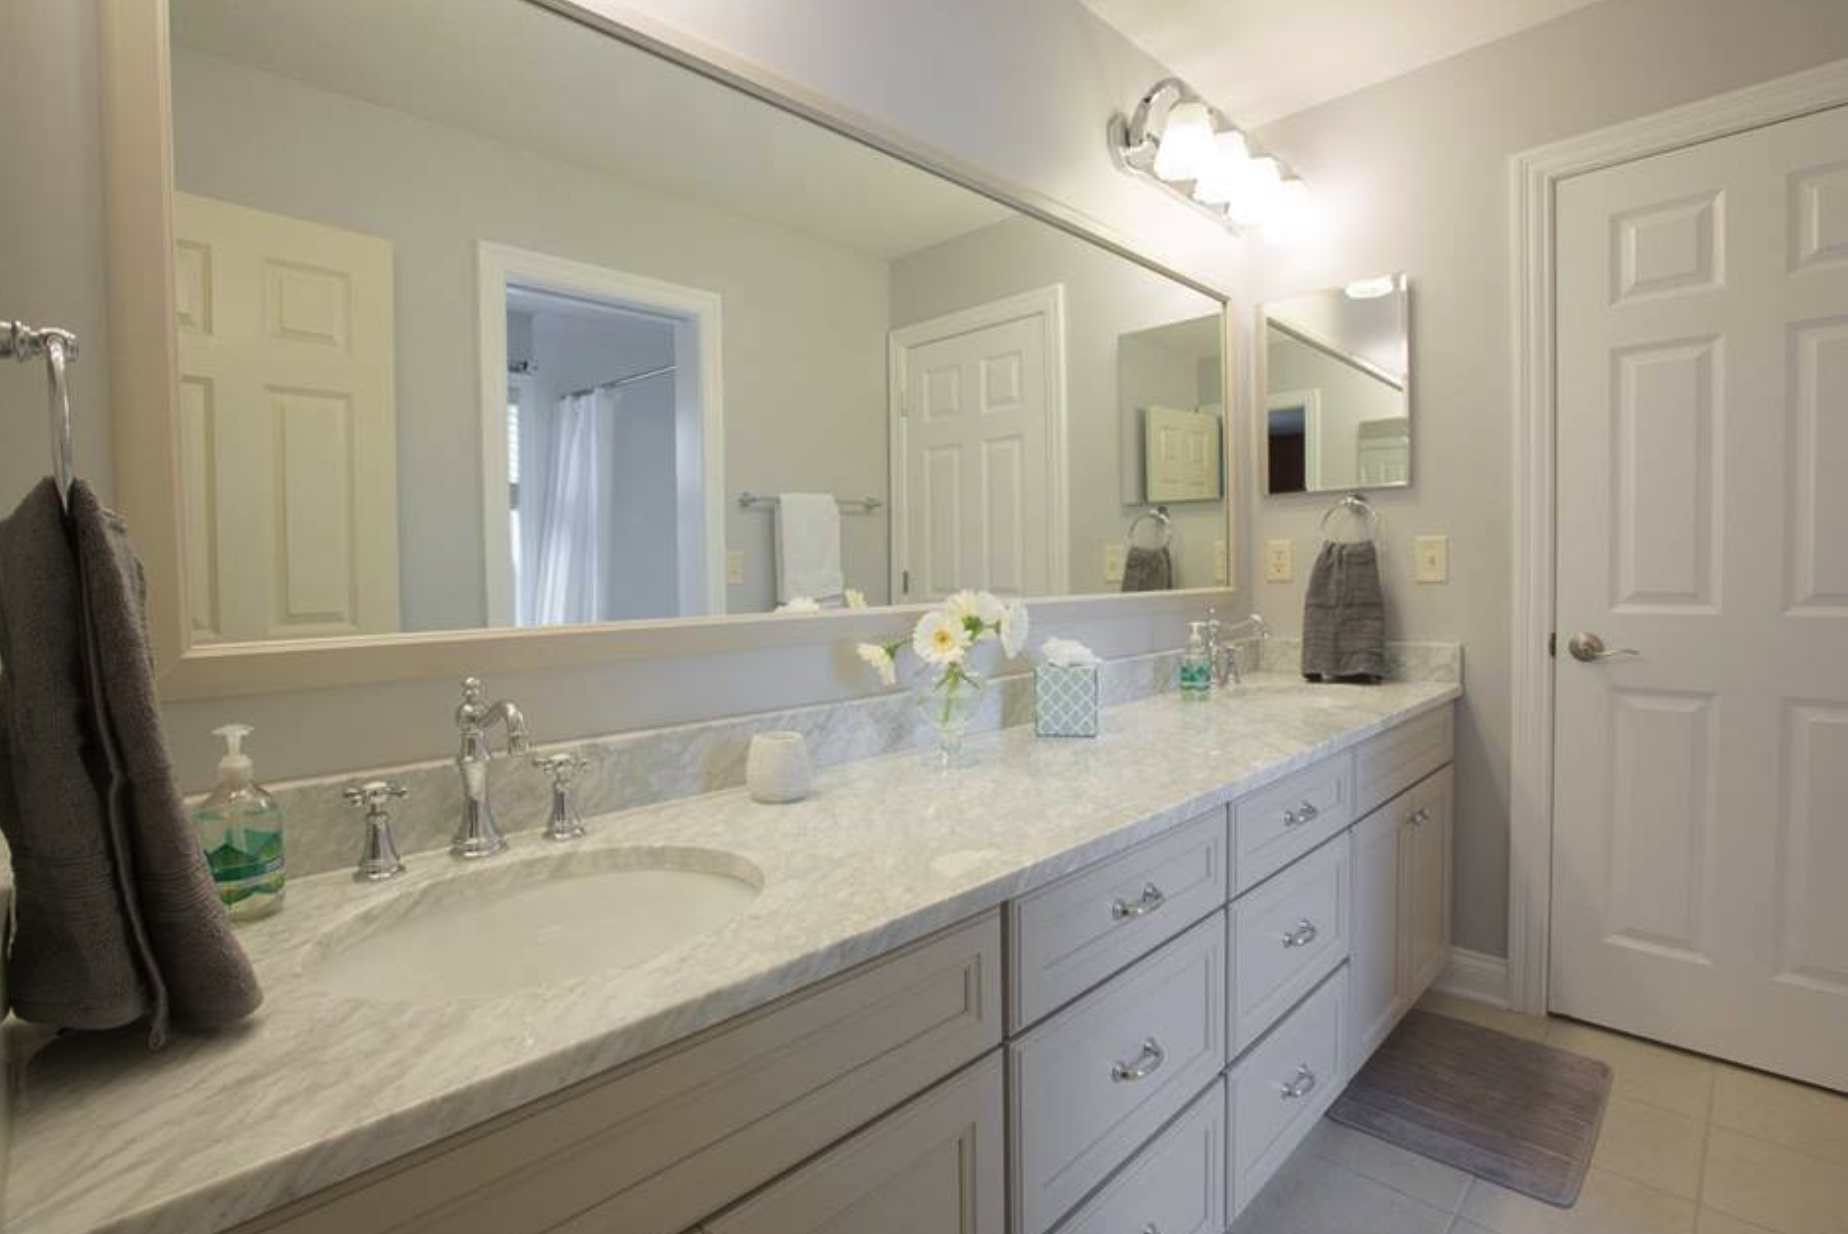 Bathroom remodeling tips luxury bathroom remodeling for Bath remodel in one day